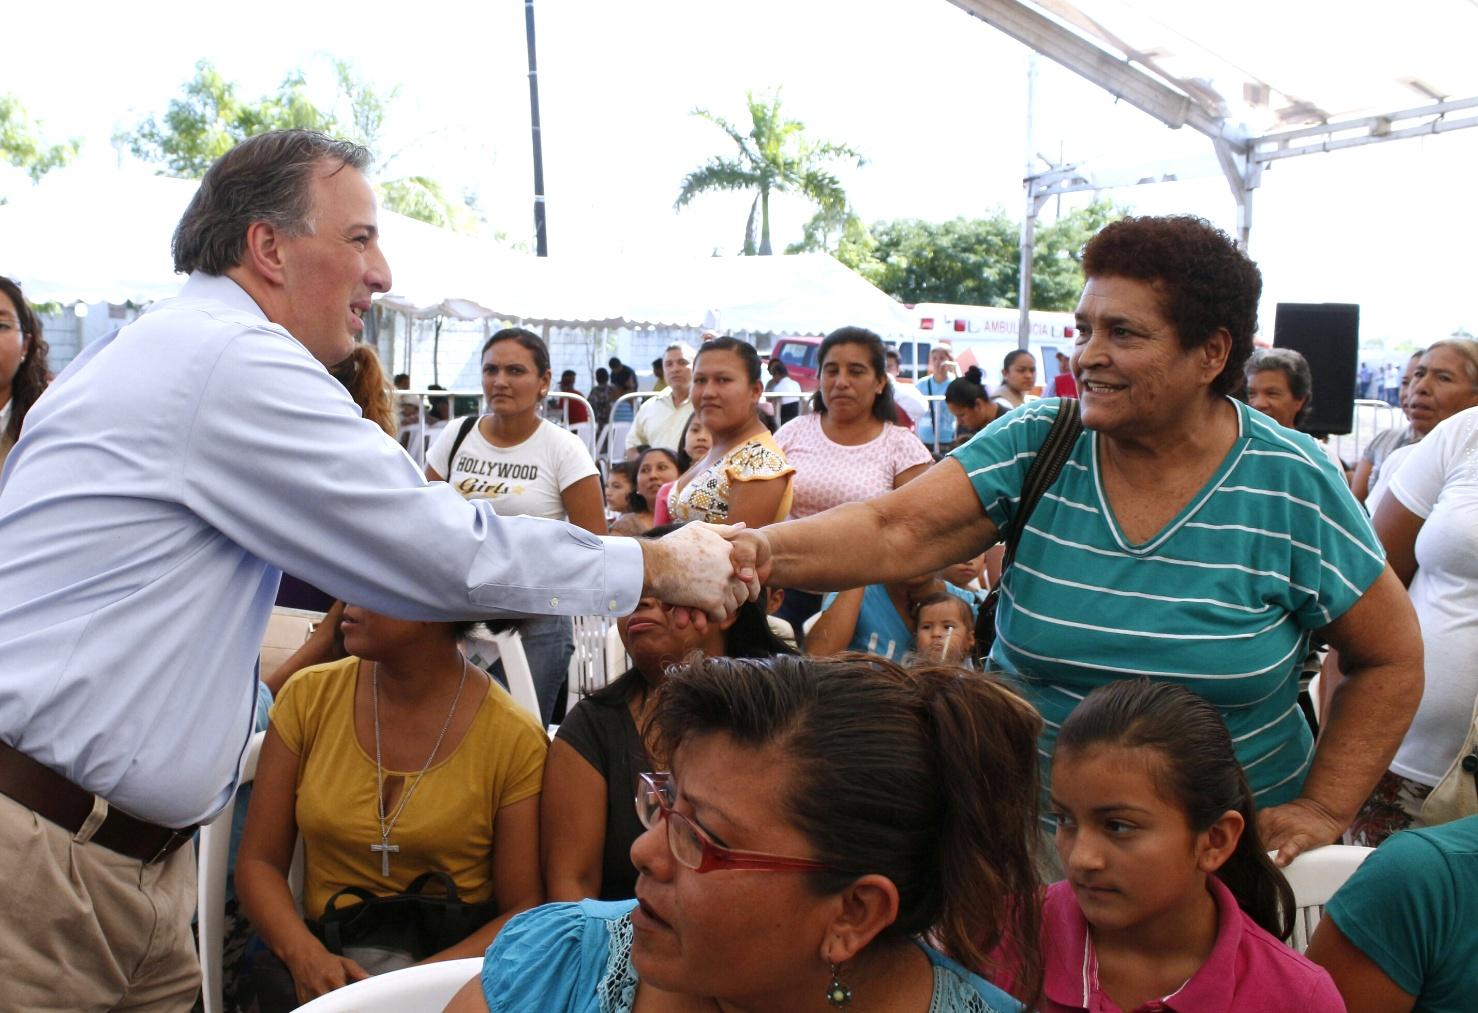 FOTO 3 Gira del secretario Meade en Tamaulipasjpg